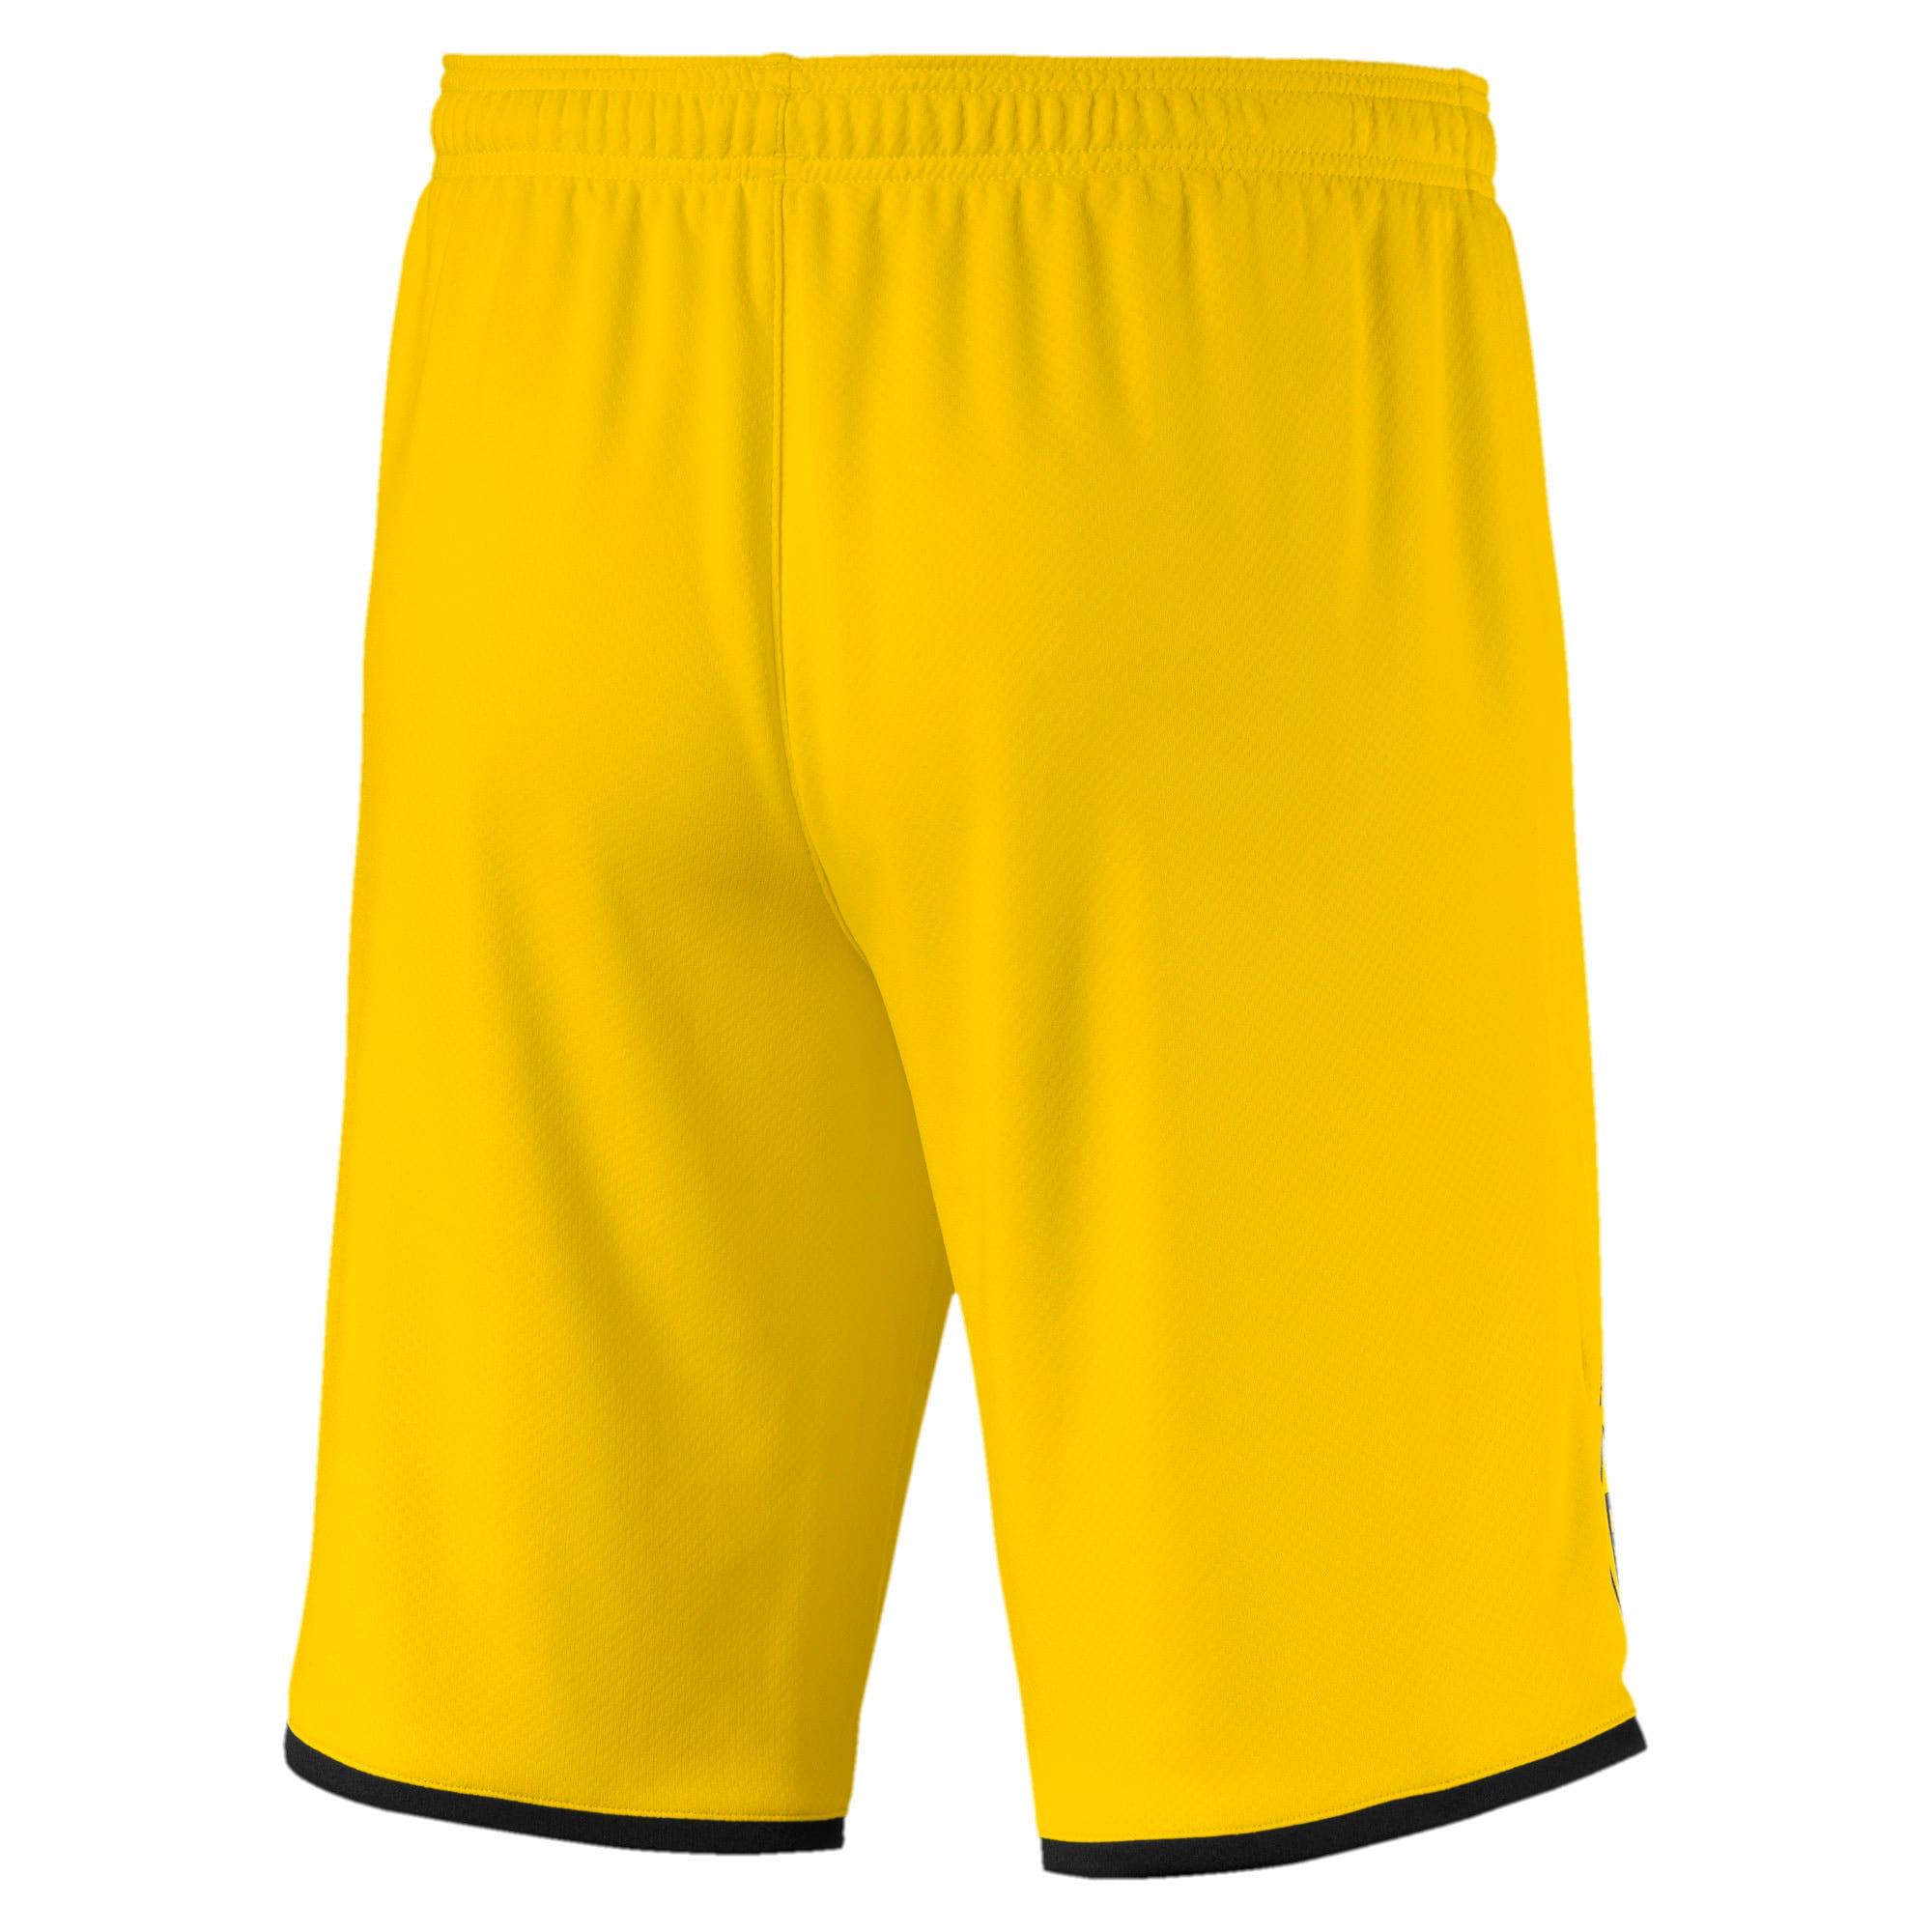 Thumbnail 2 of BVB Men's Away Replica Shorts, Cyber Yellow-Puma Black, medium